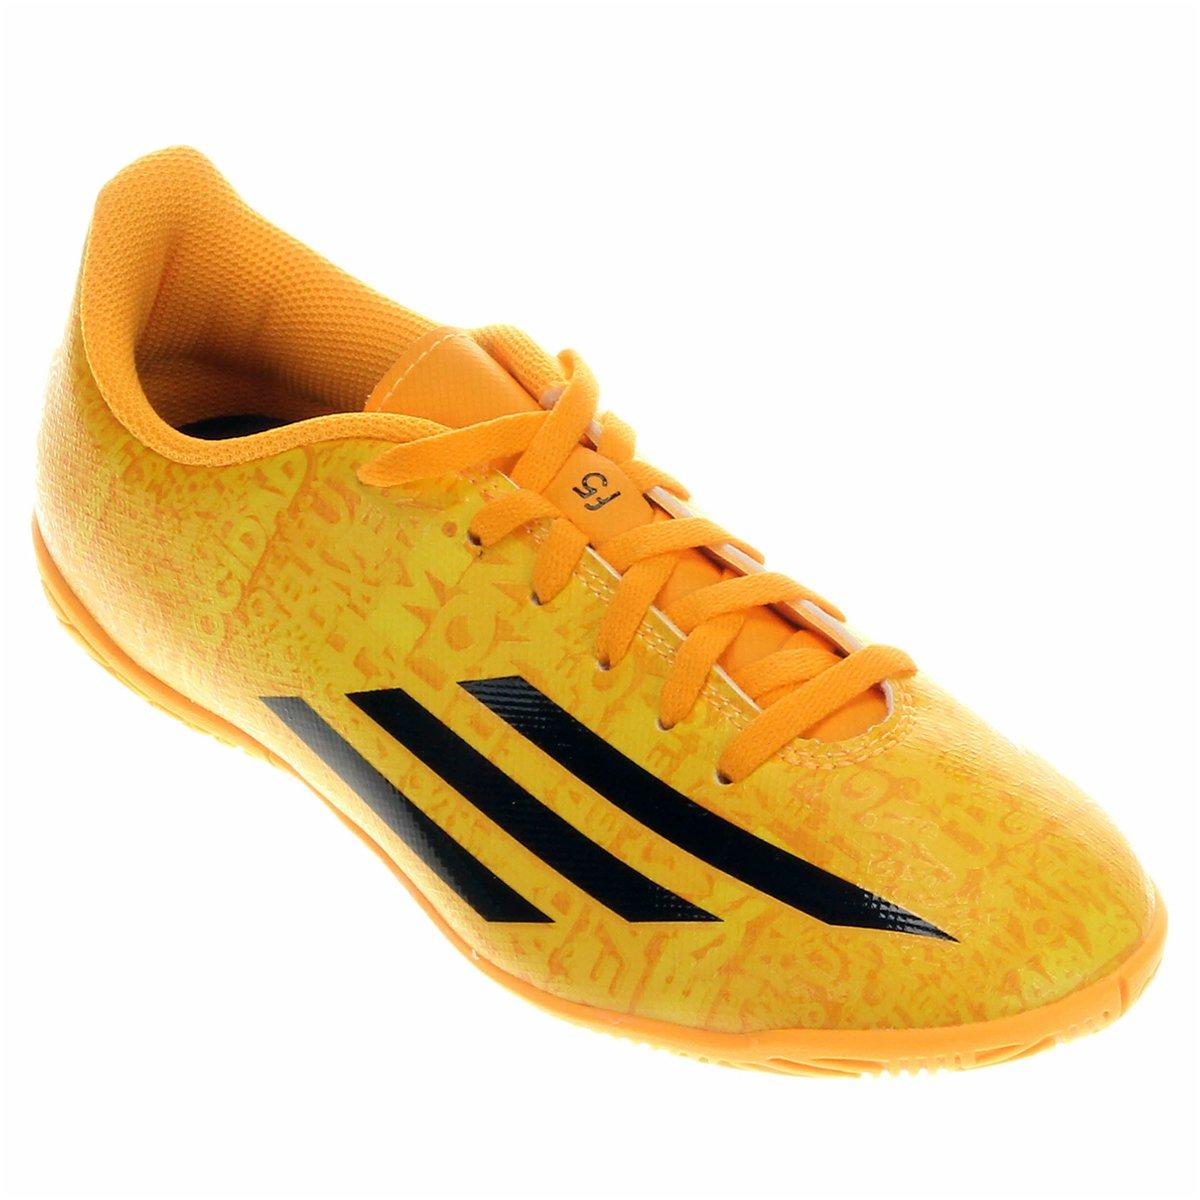 Adidas F5 Messi chuteira adidas f5 in messi juvenil - compre agora | netshoes